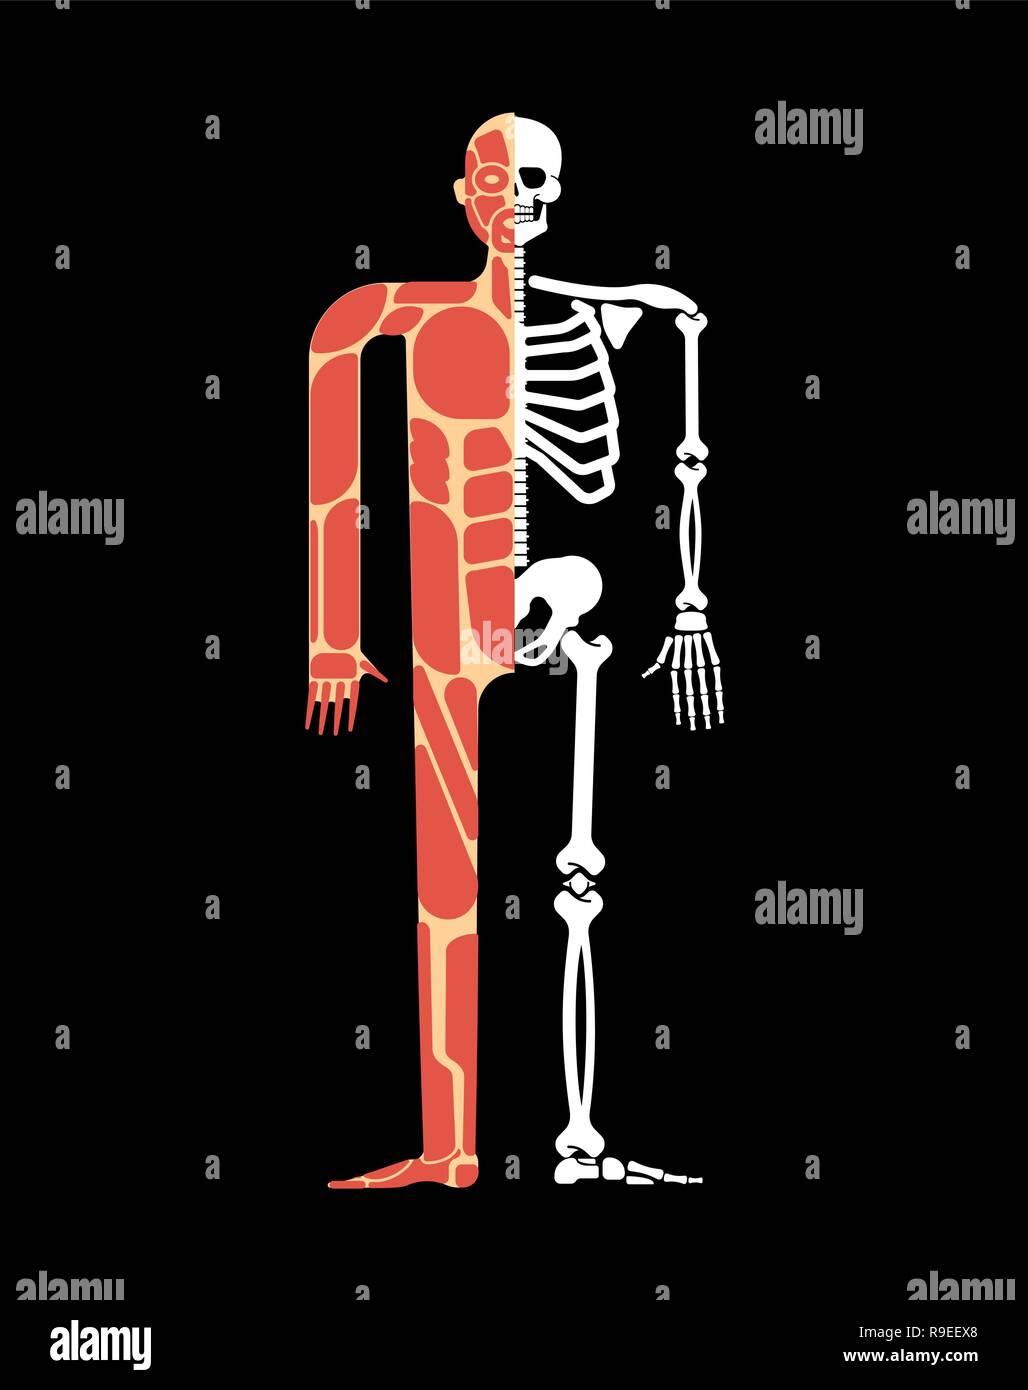 Skeletal Muscle Fiber Stock Photos Skeletal Muscle Fiber Stock